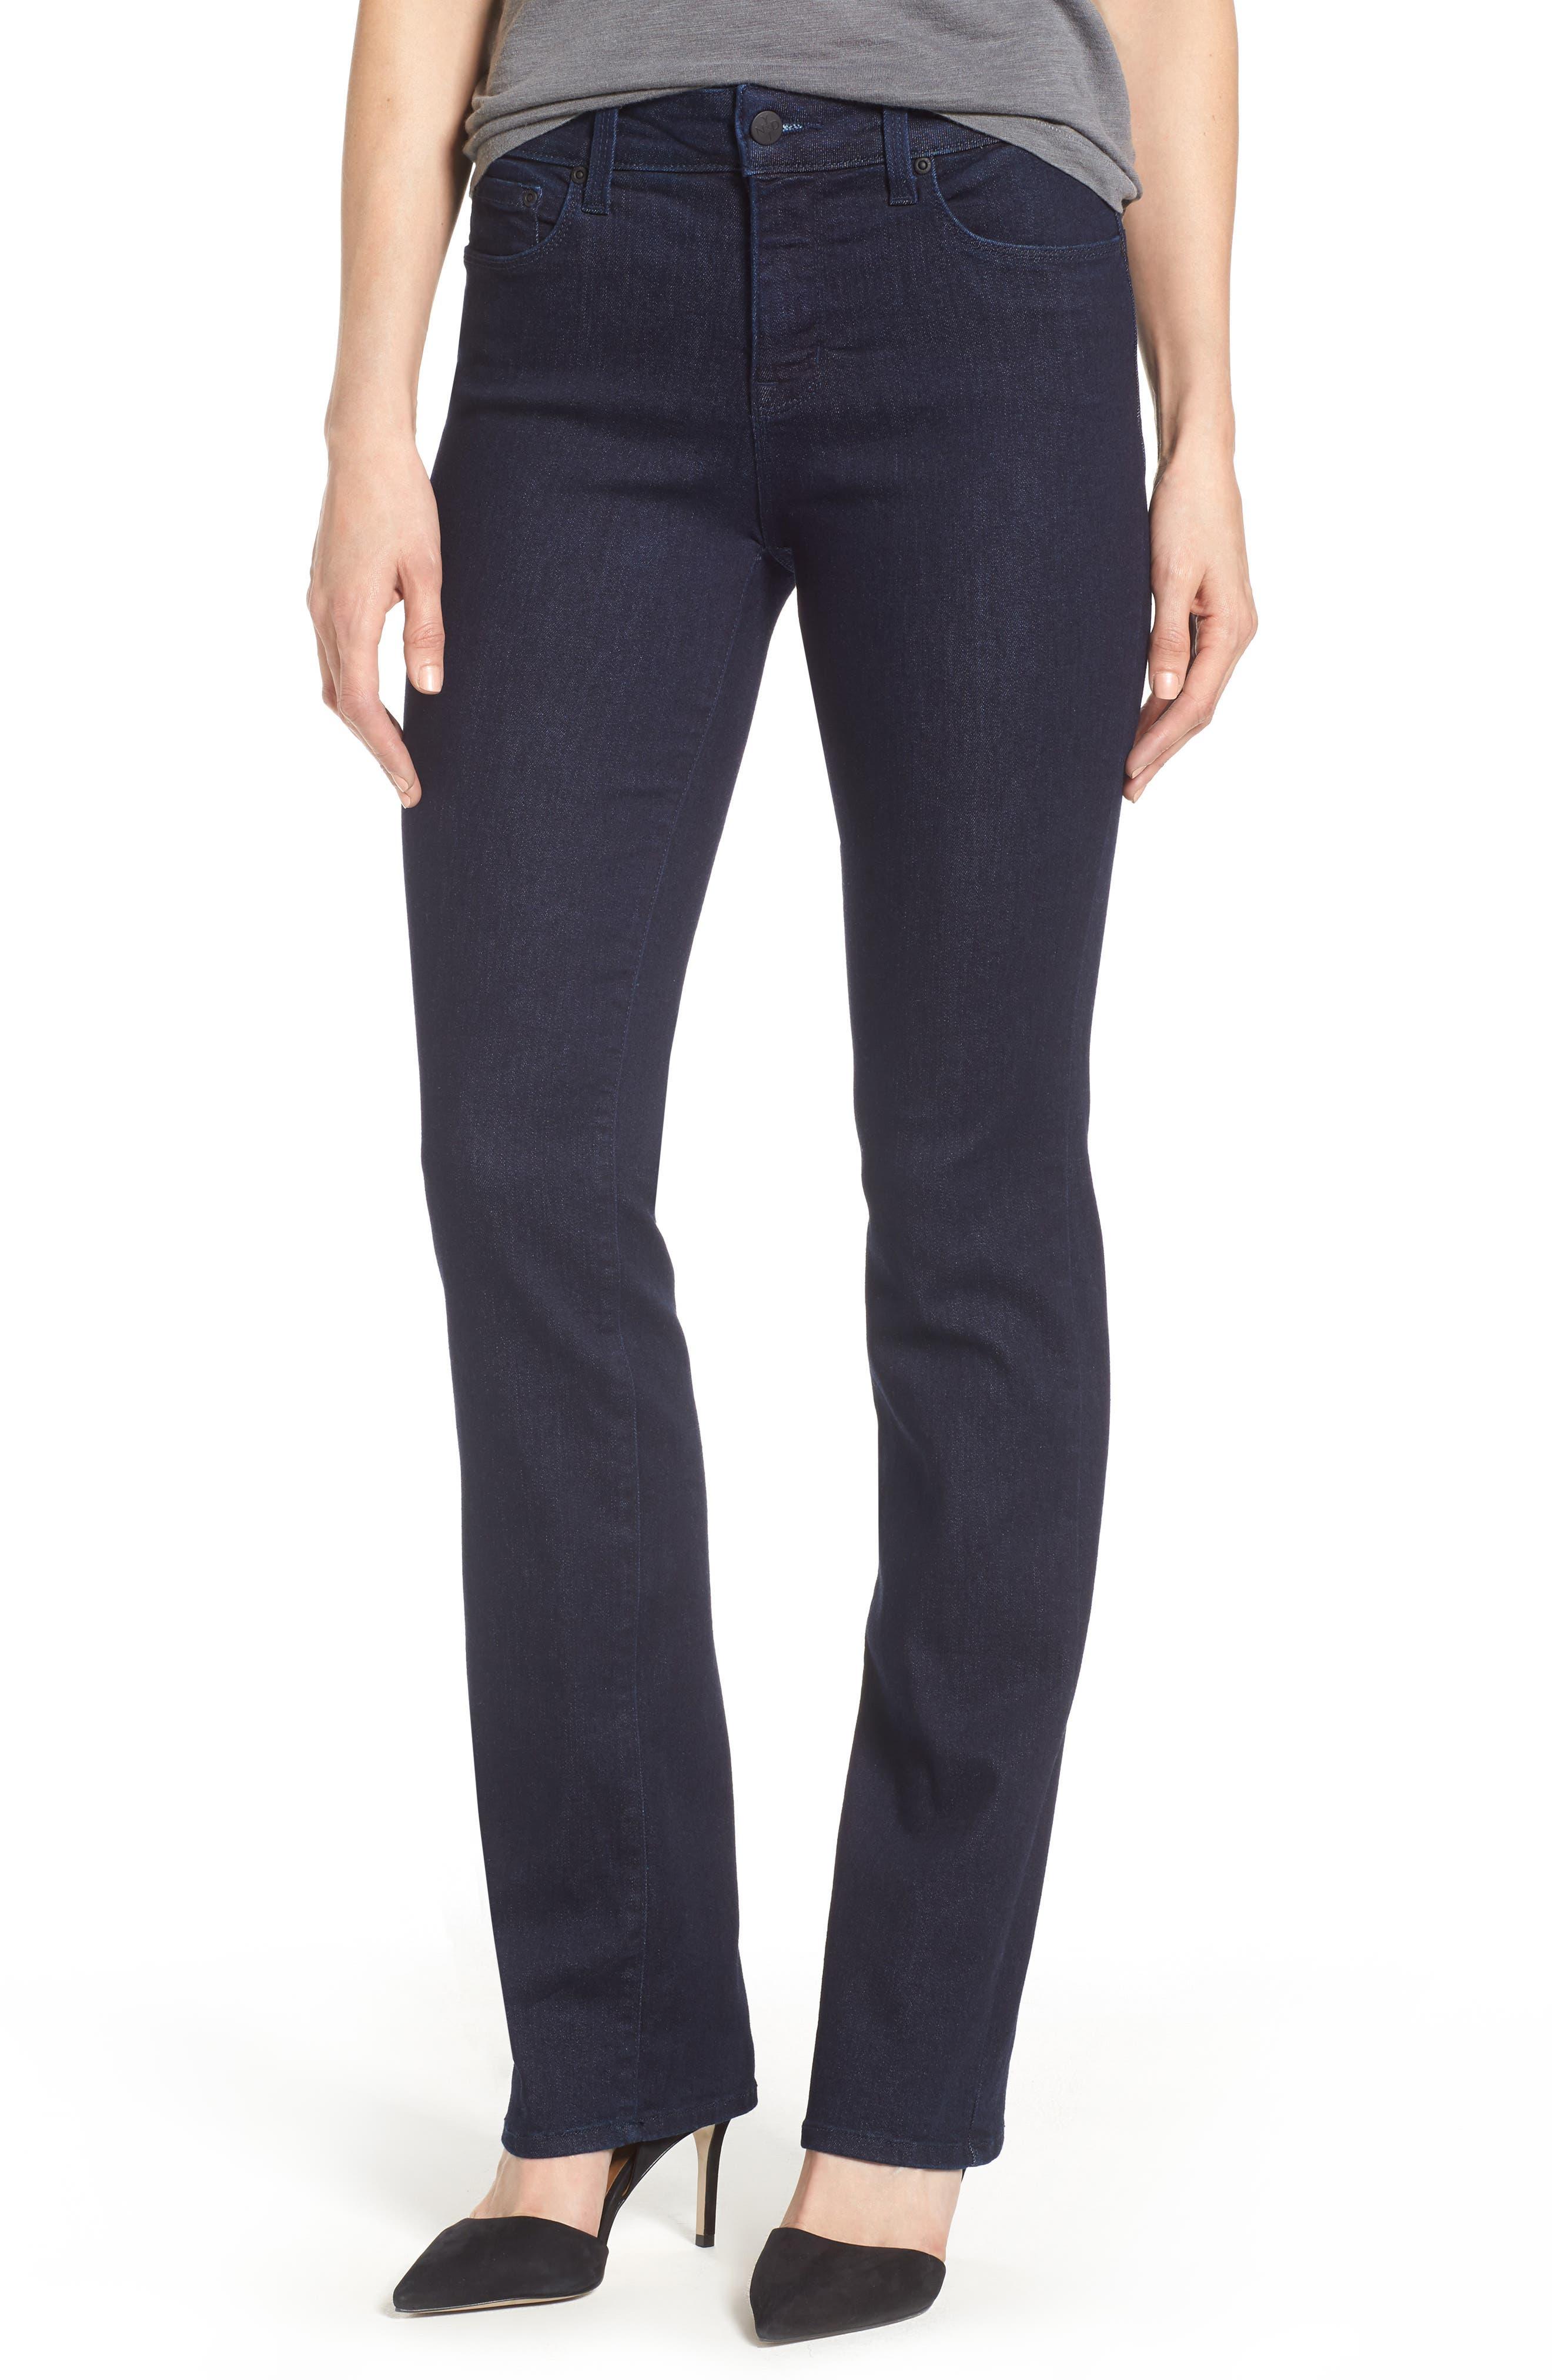 Main Image - NYDJ Marilyn Stretch Straight Leg Jeans (Rinse) (Regular & Petite)